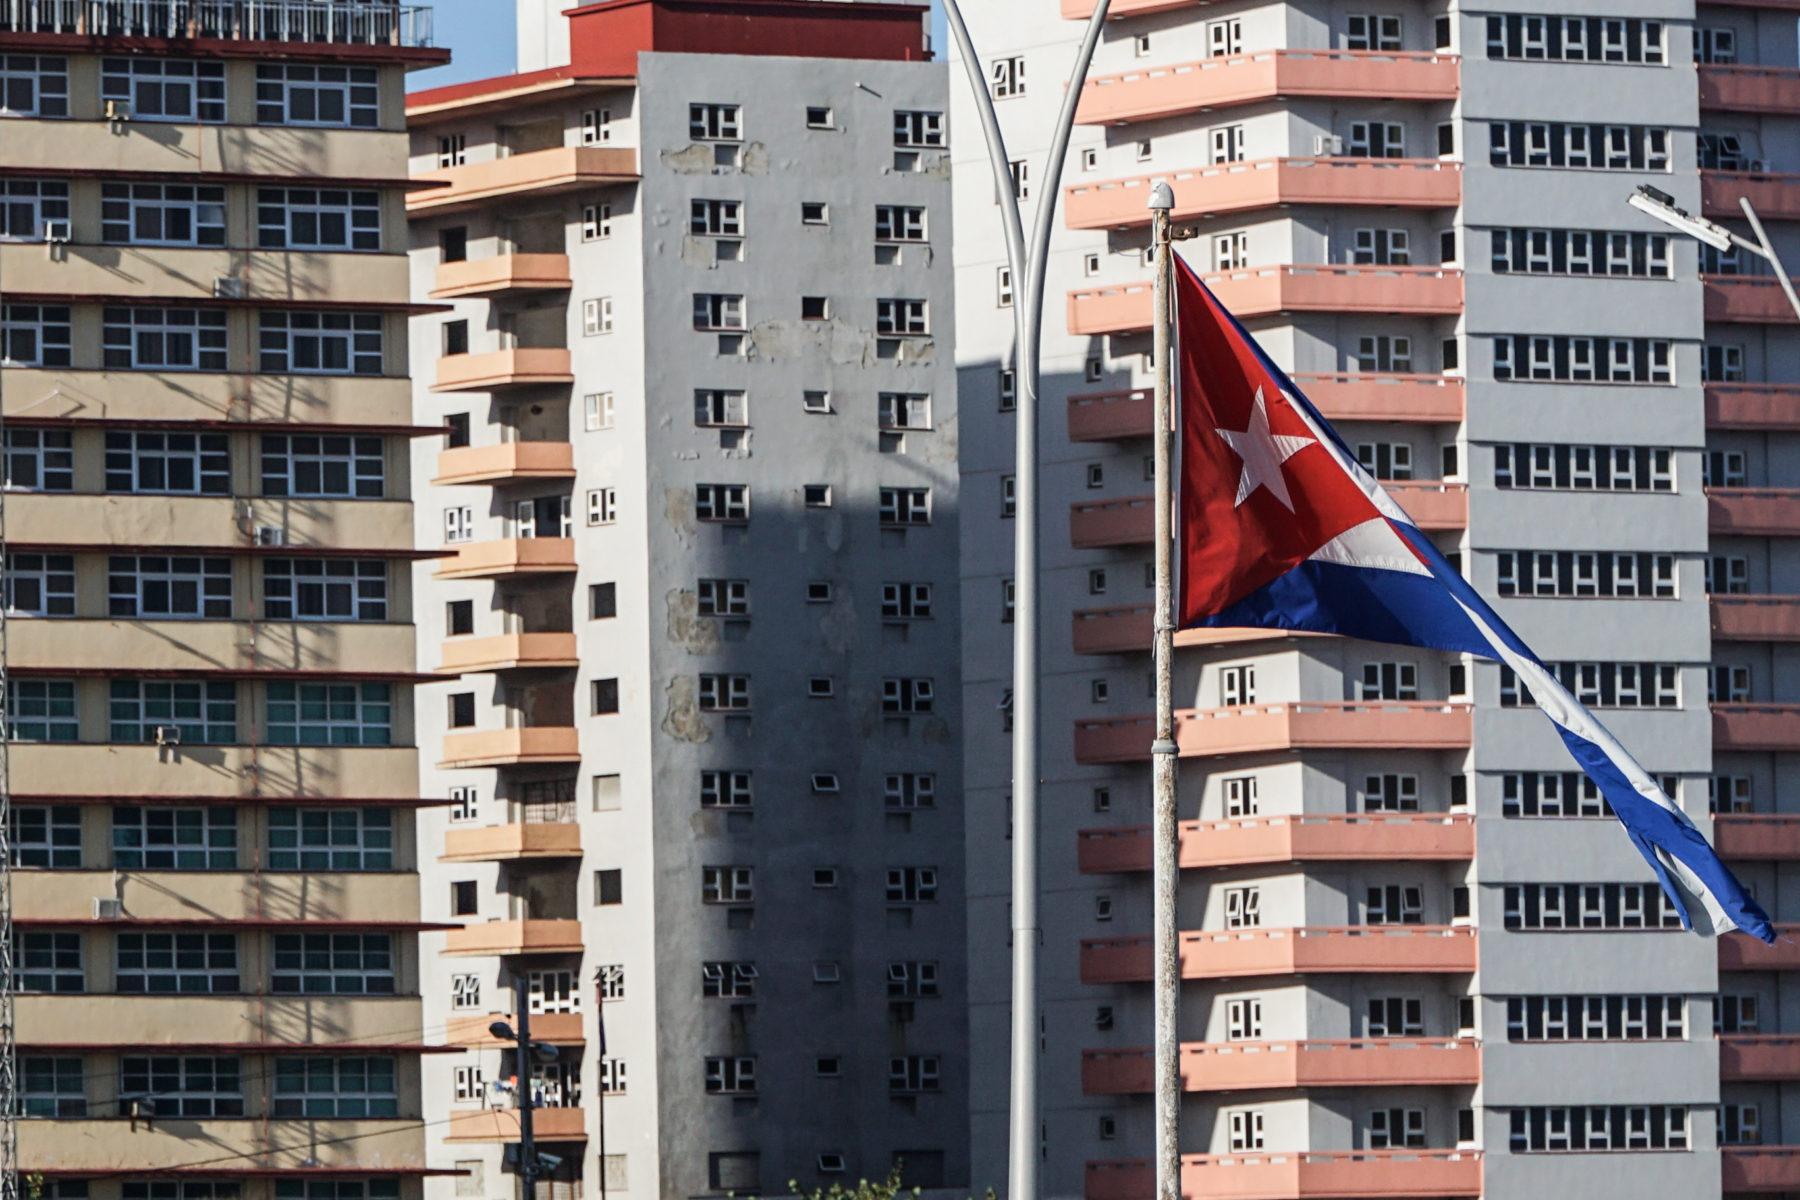 10-ragioni-per-amare-l-avana-bandiera-cubana